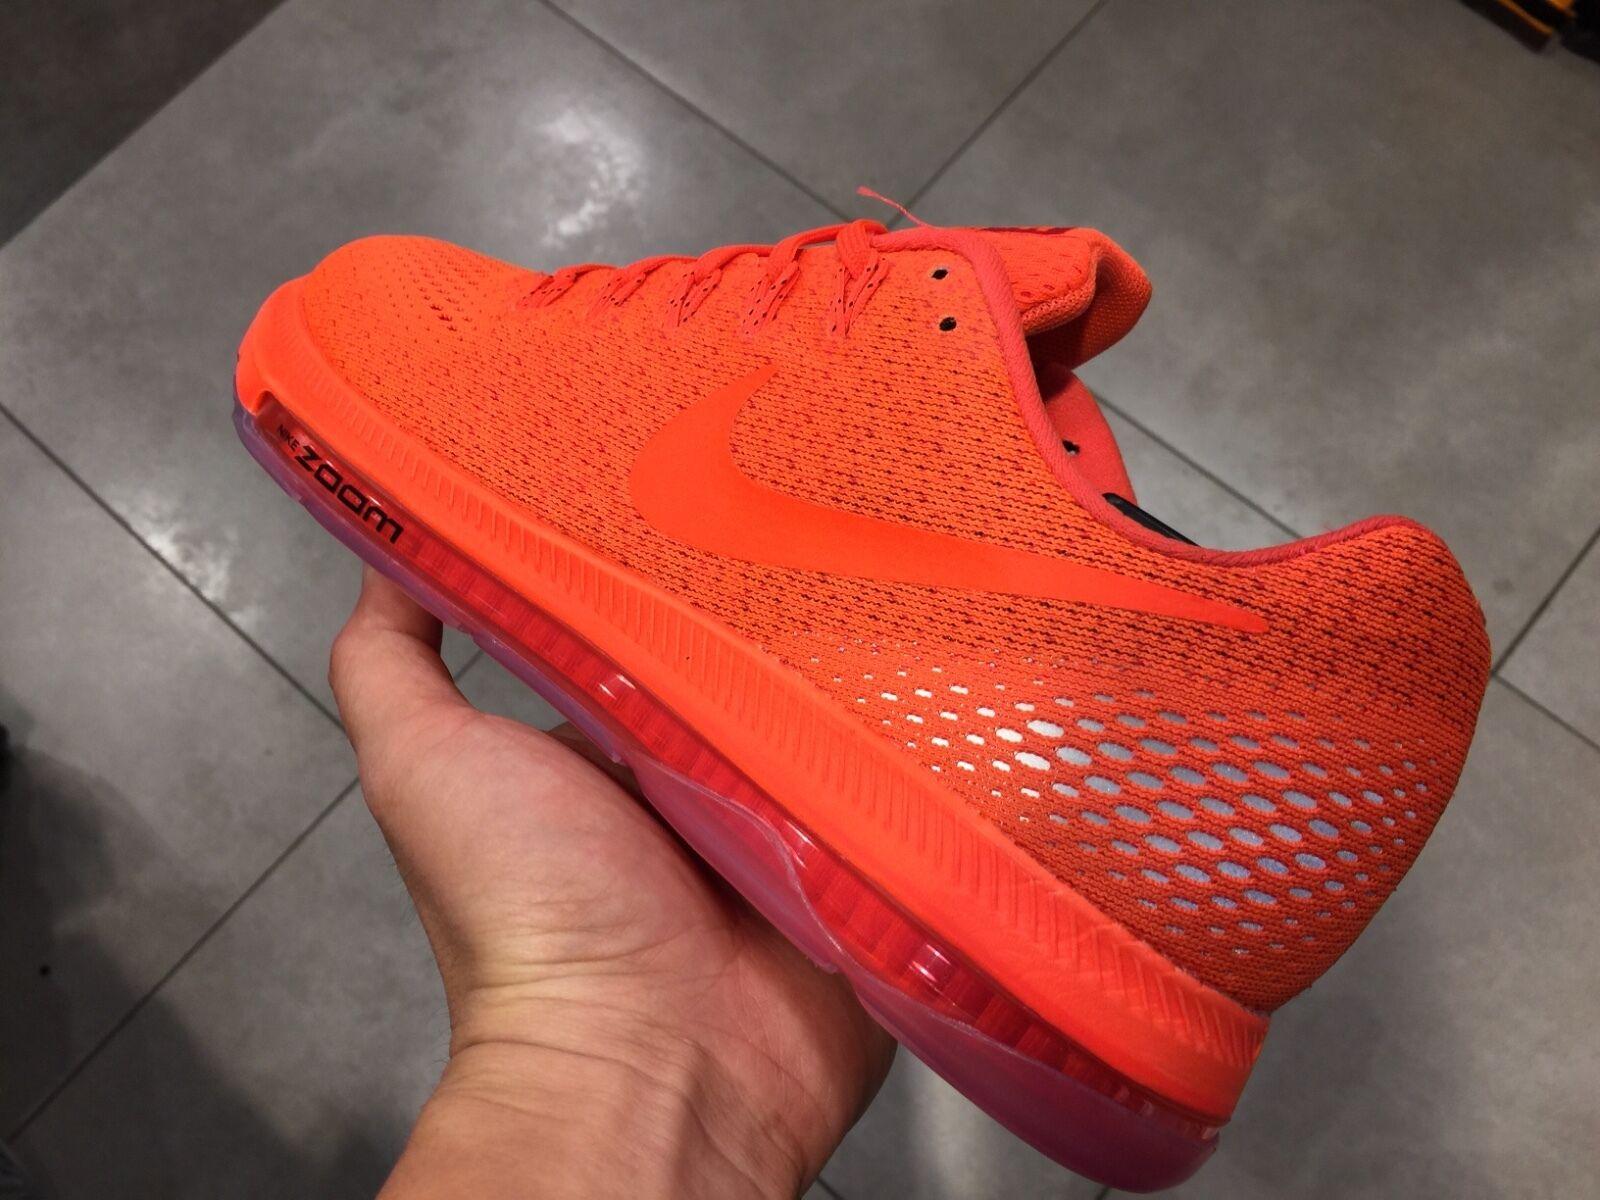 Nike Air Flywire run neon orange running Flyknit racer 95 Max 90 3.26 vapormax 1